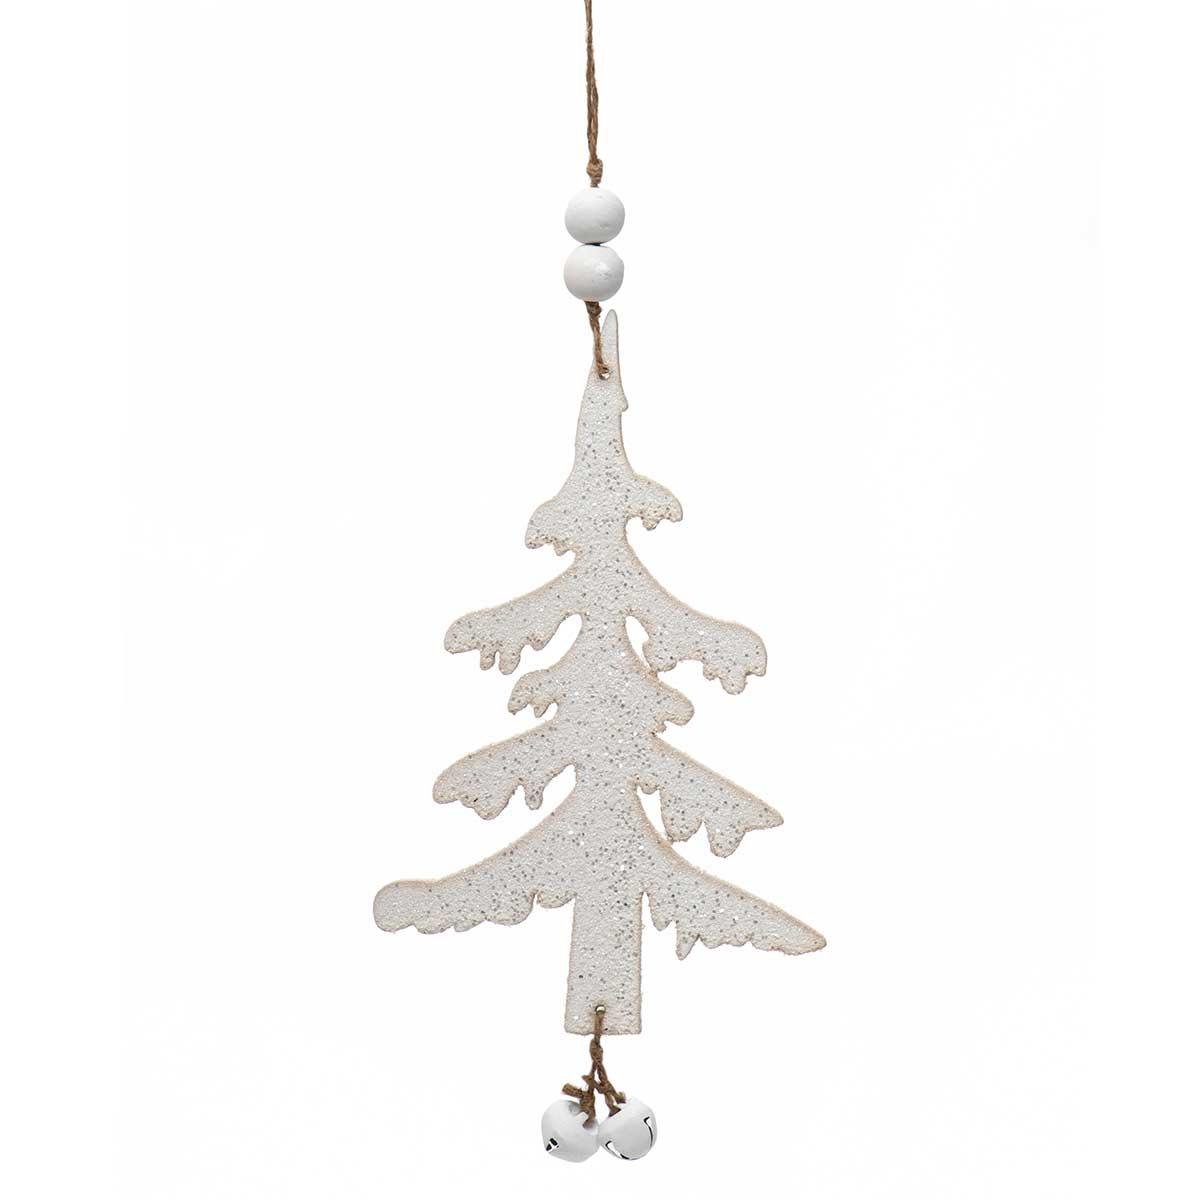 WHITE WOOD TREE DANGLE ORNAMENT